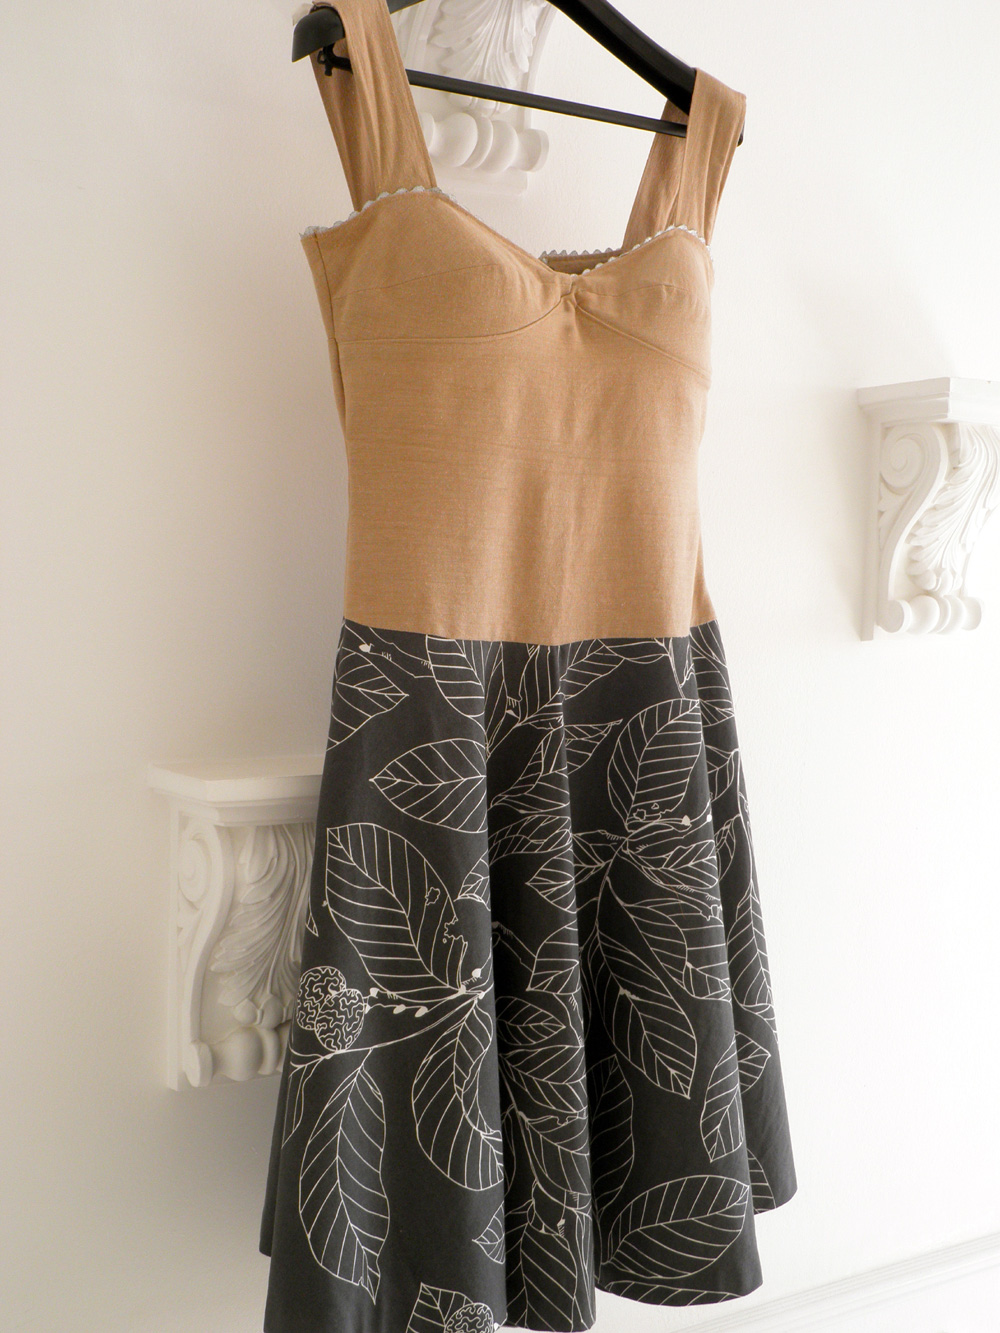 Drop Waist Corset Dress – Sewing Projects | BurdaStyle.com